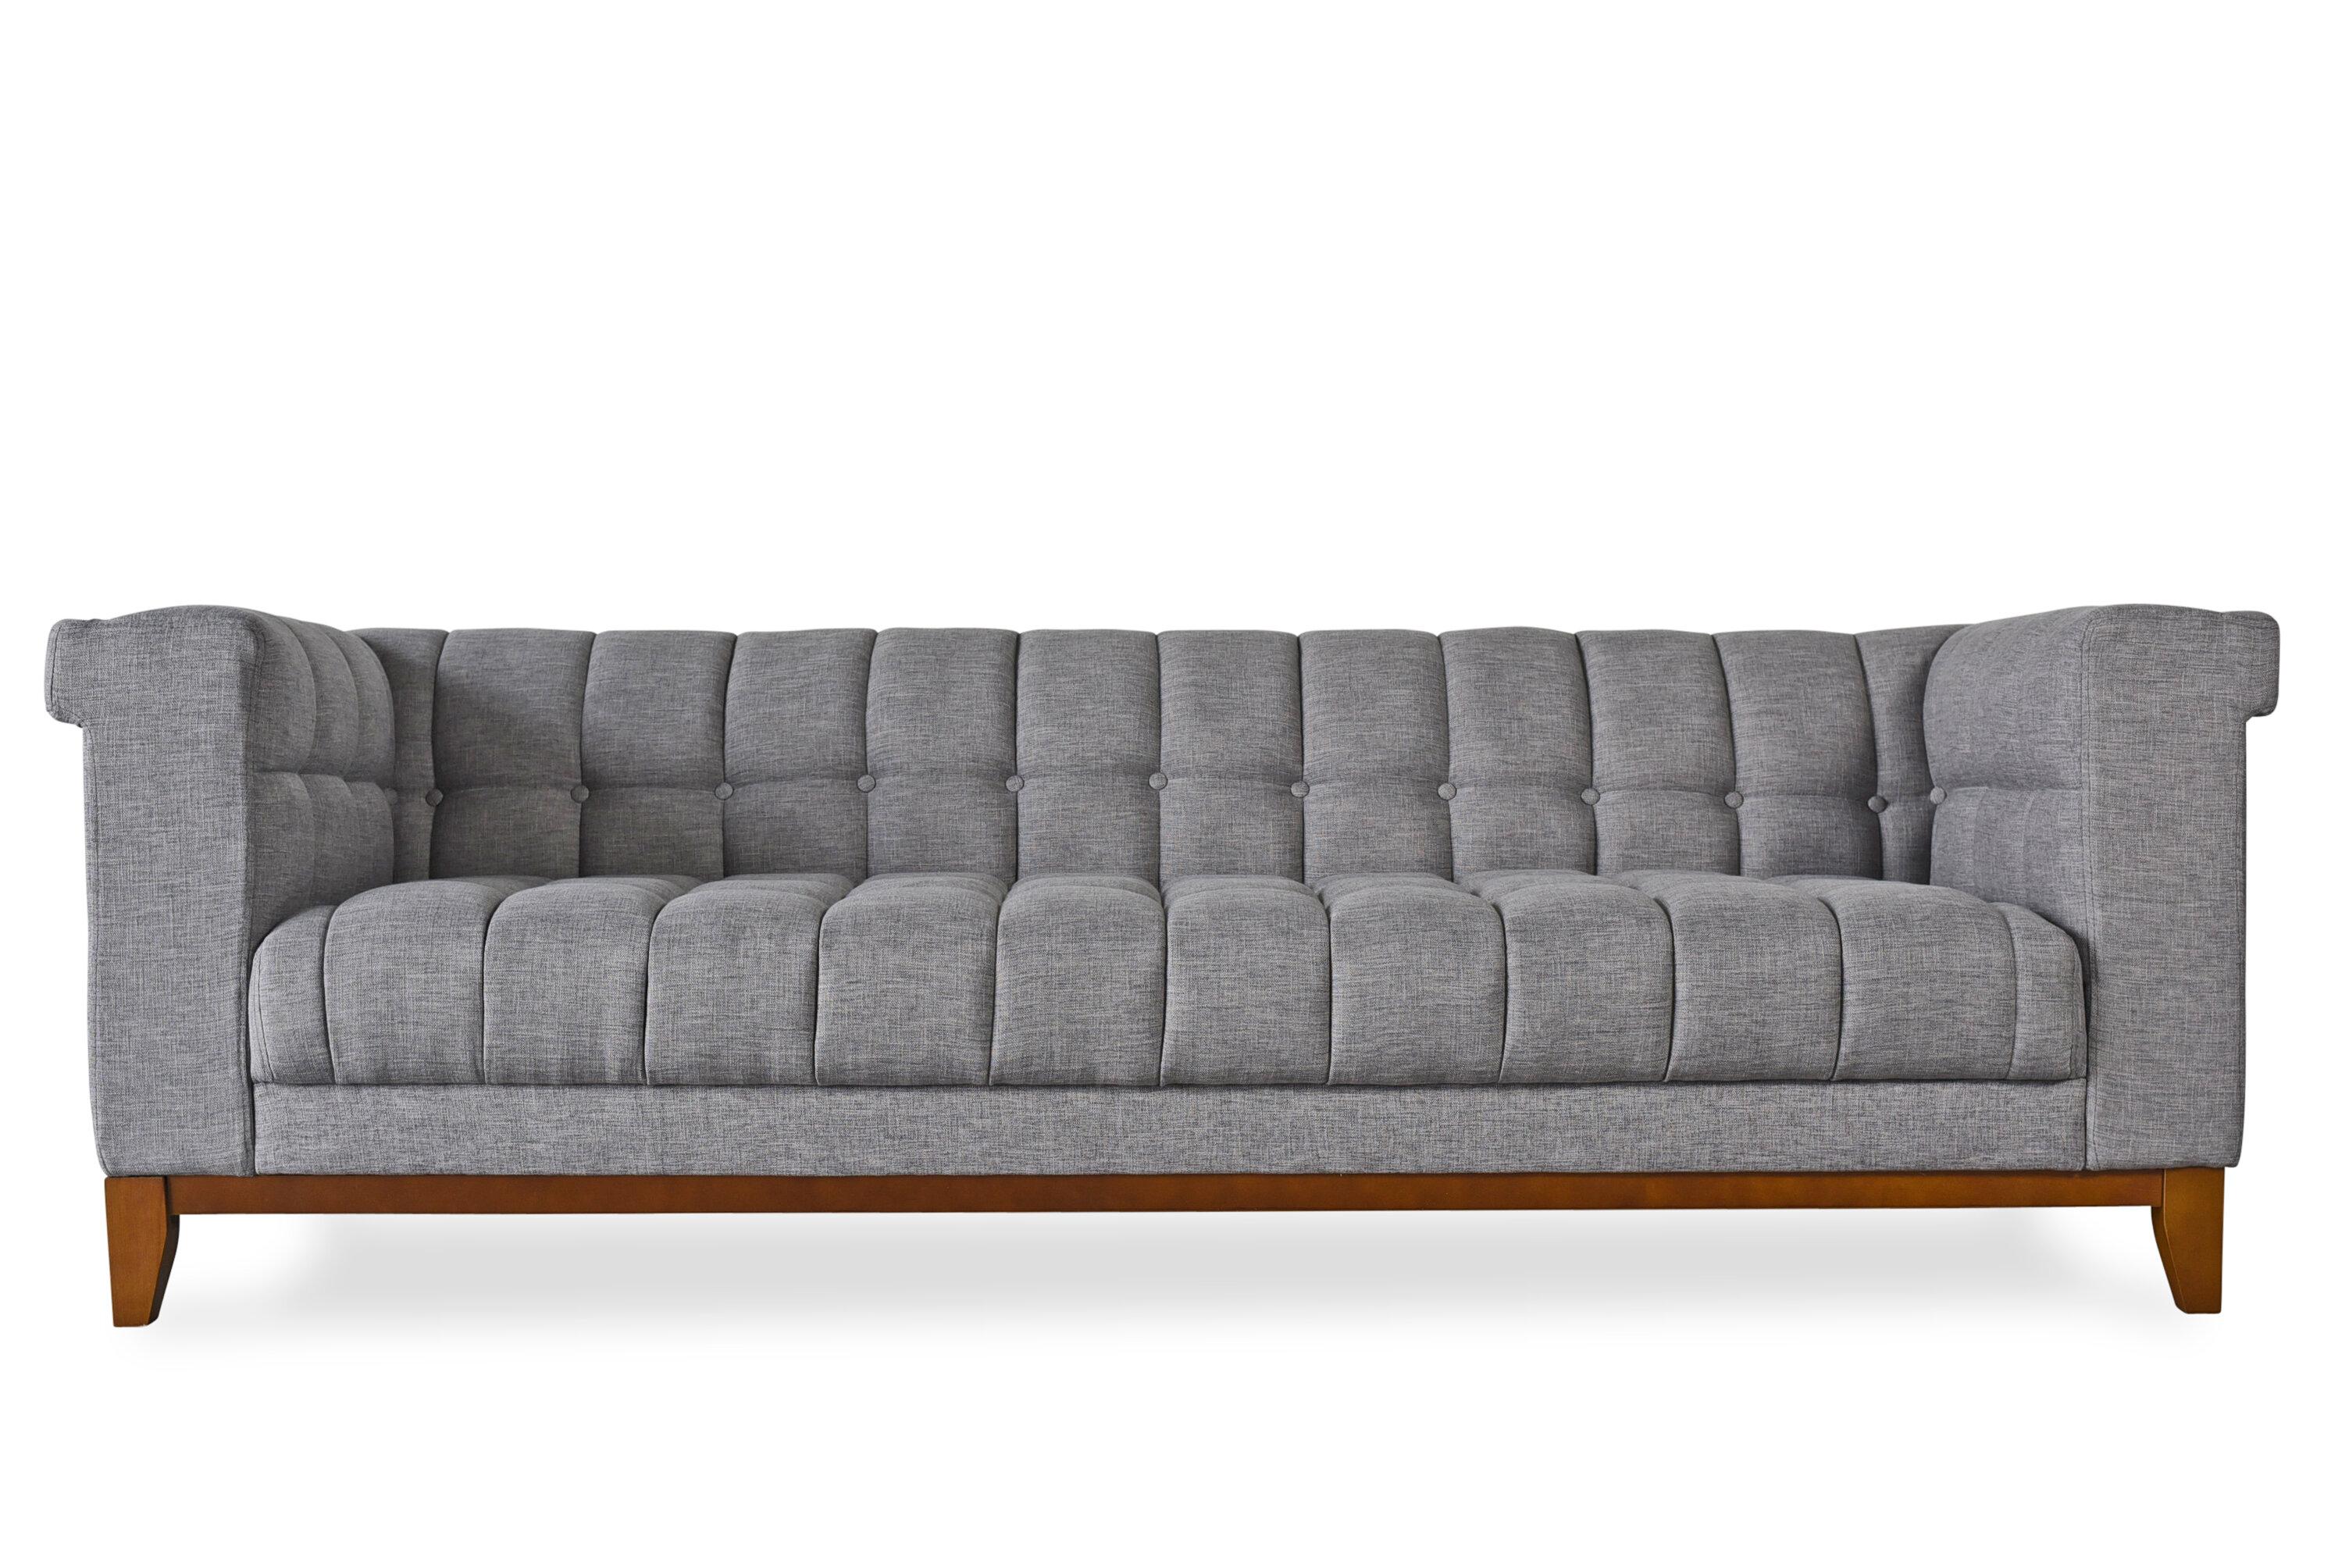 Everly Quinn Claughaun Modern Chesterfield Sofa | Wayfair